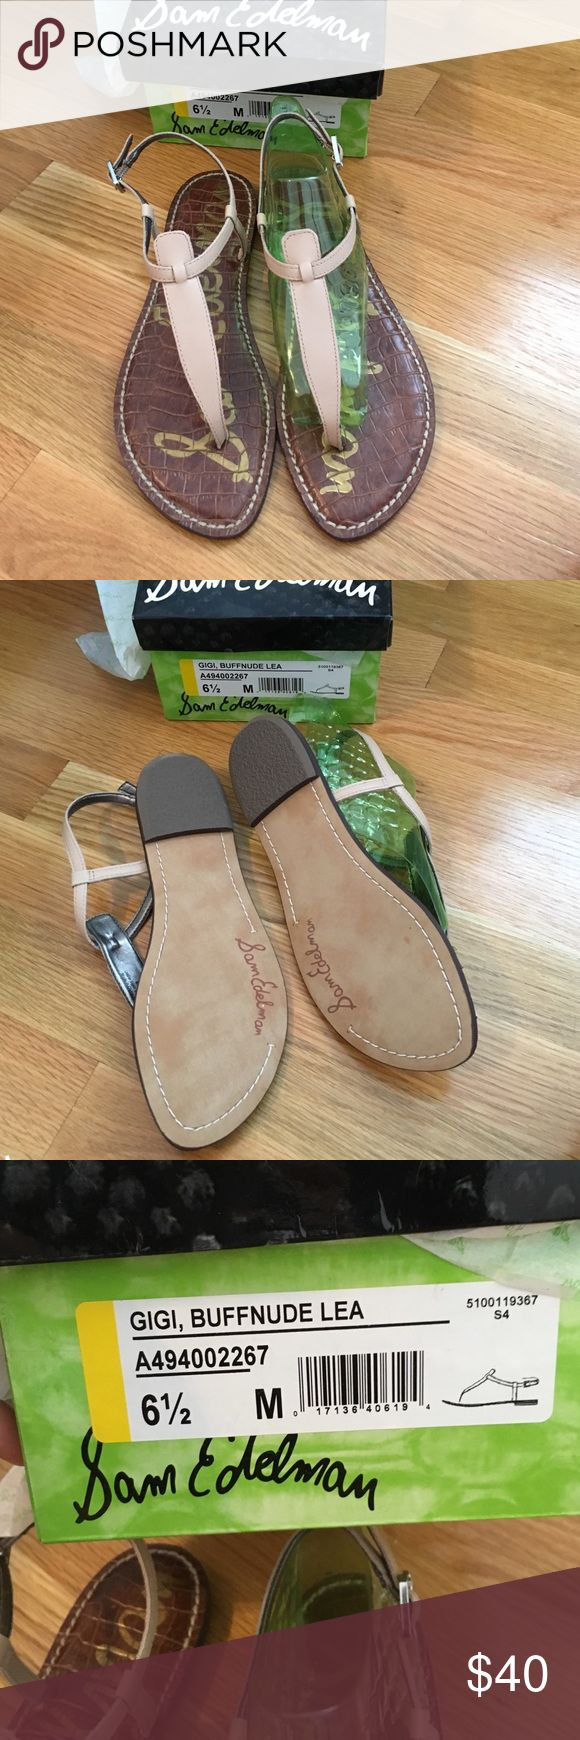 NWT Sam Edelman Gigi Sandal Never worn! Still in the box with original packaging. Sam Edelman Shoes Sandals